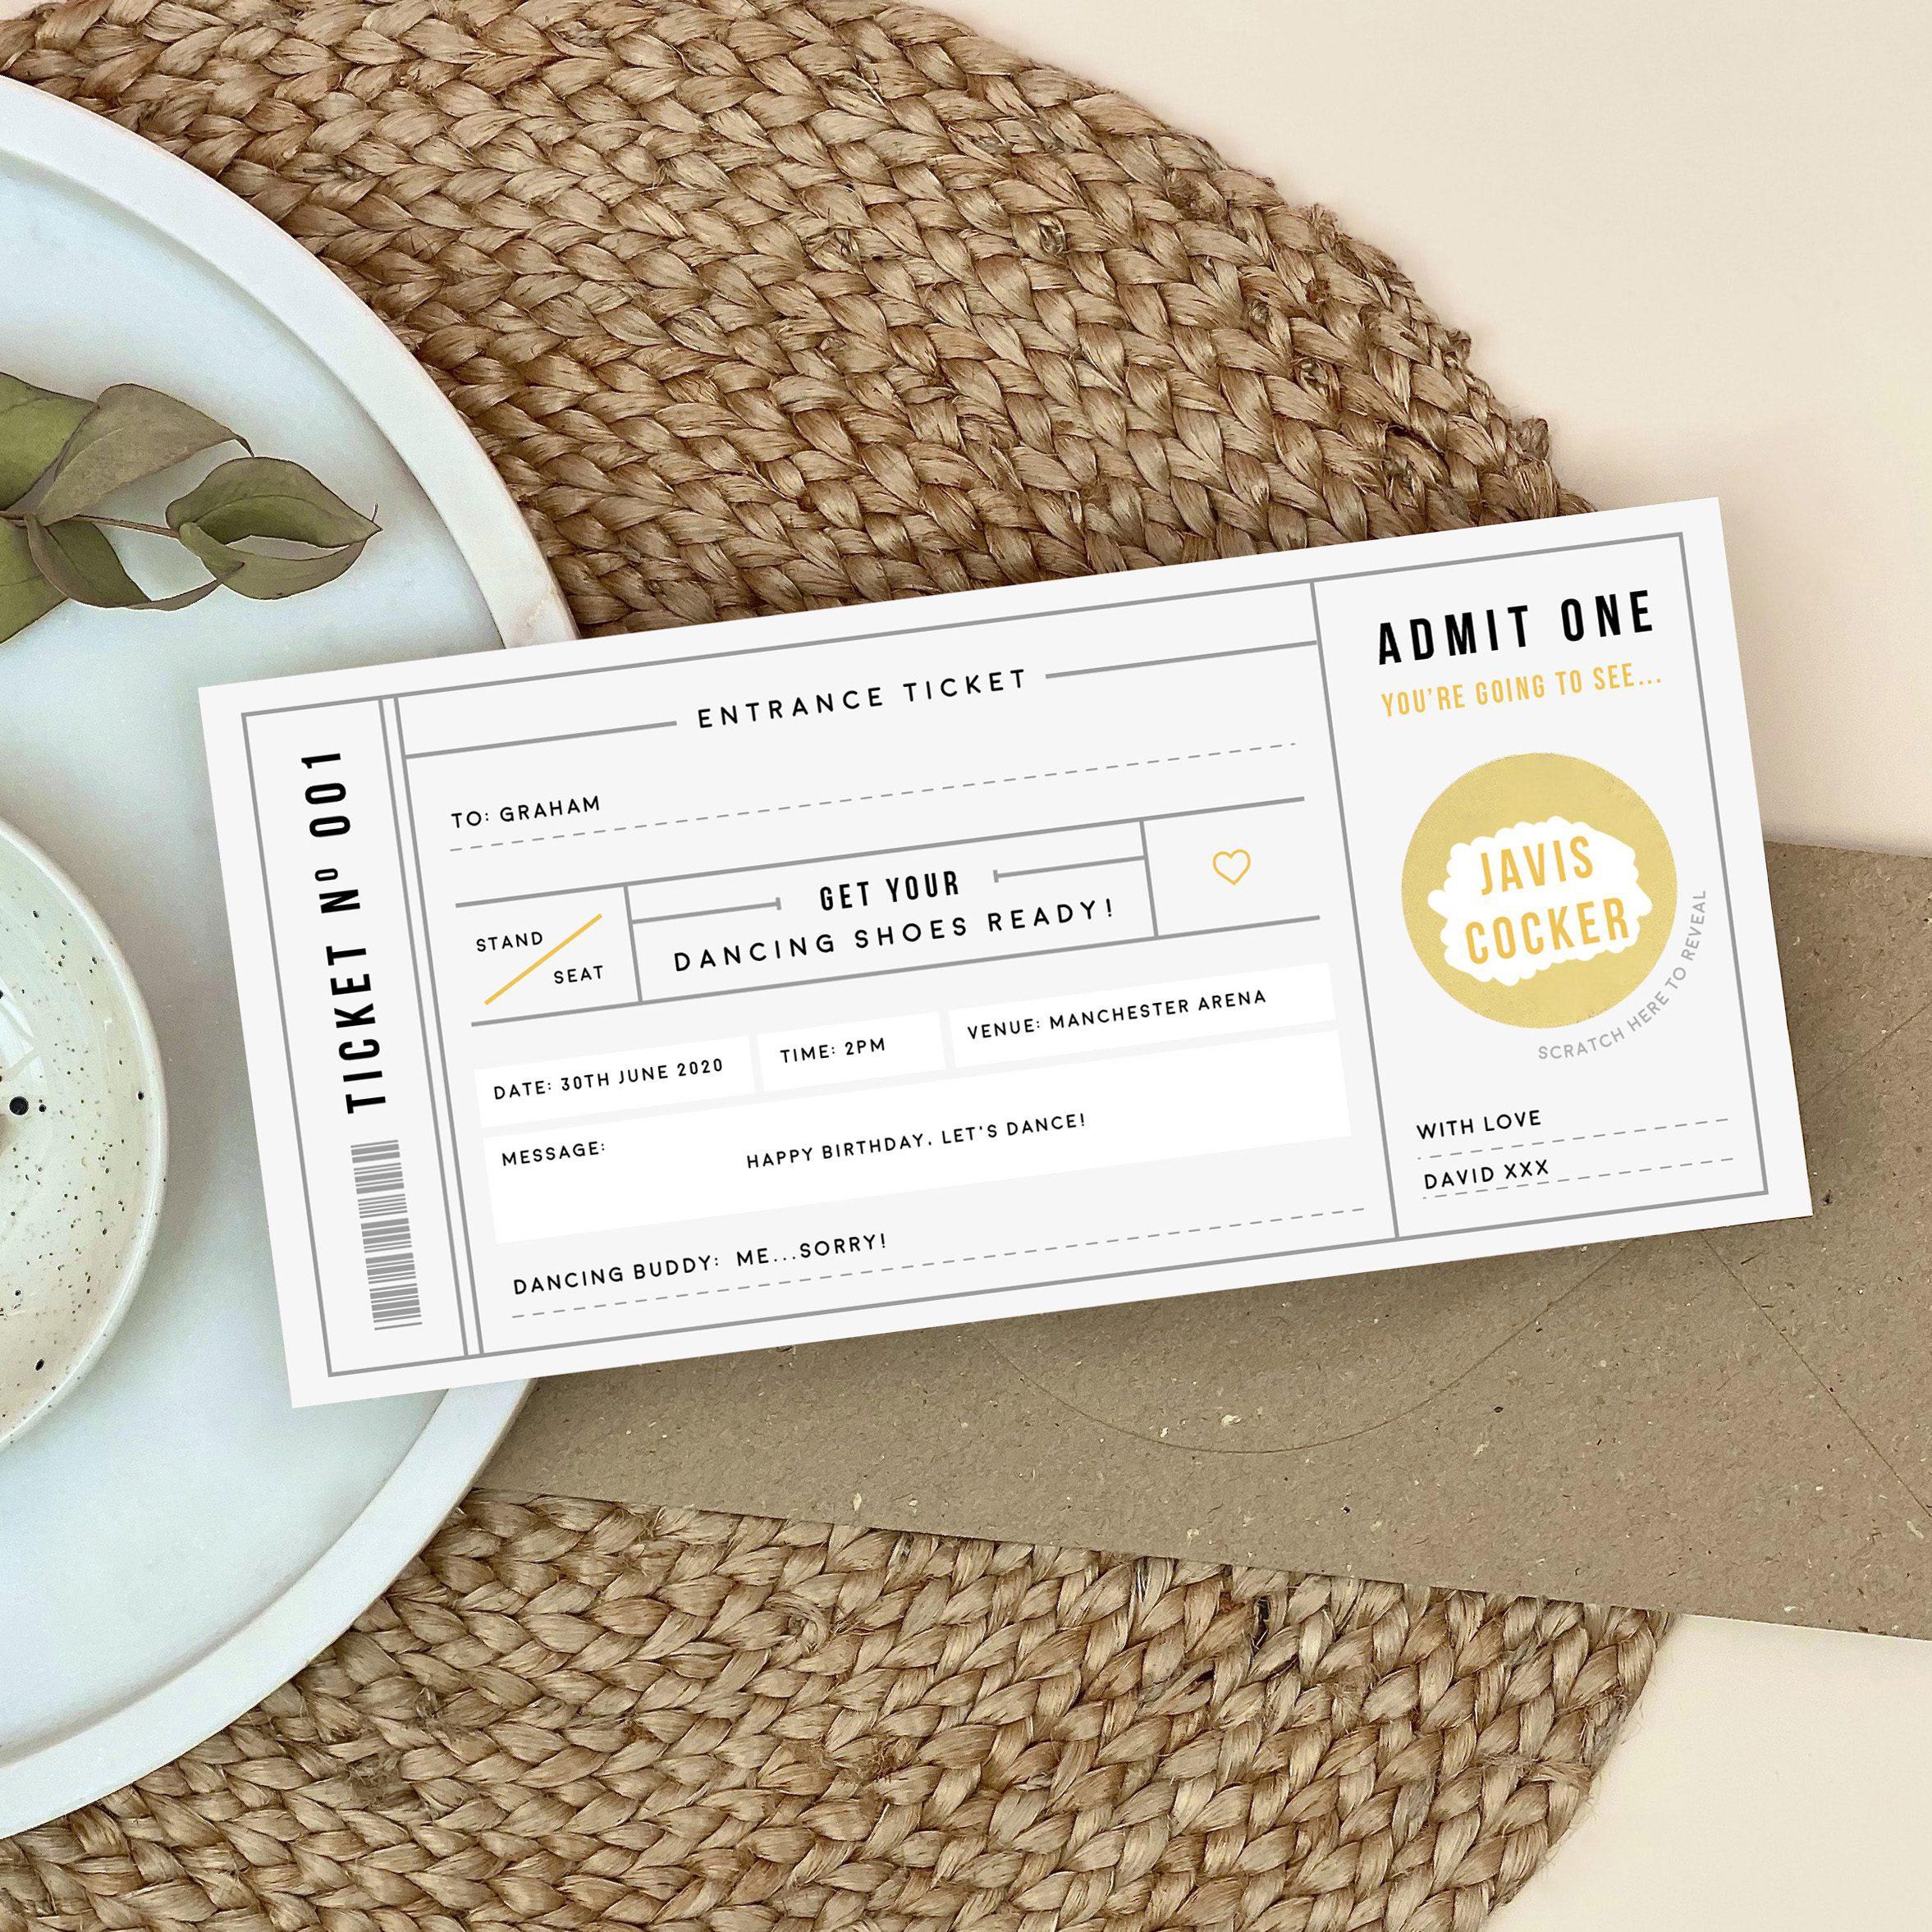 Grey Scratch Off Concert Ticket - Designed by Rodo Creative